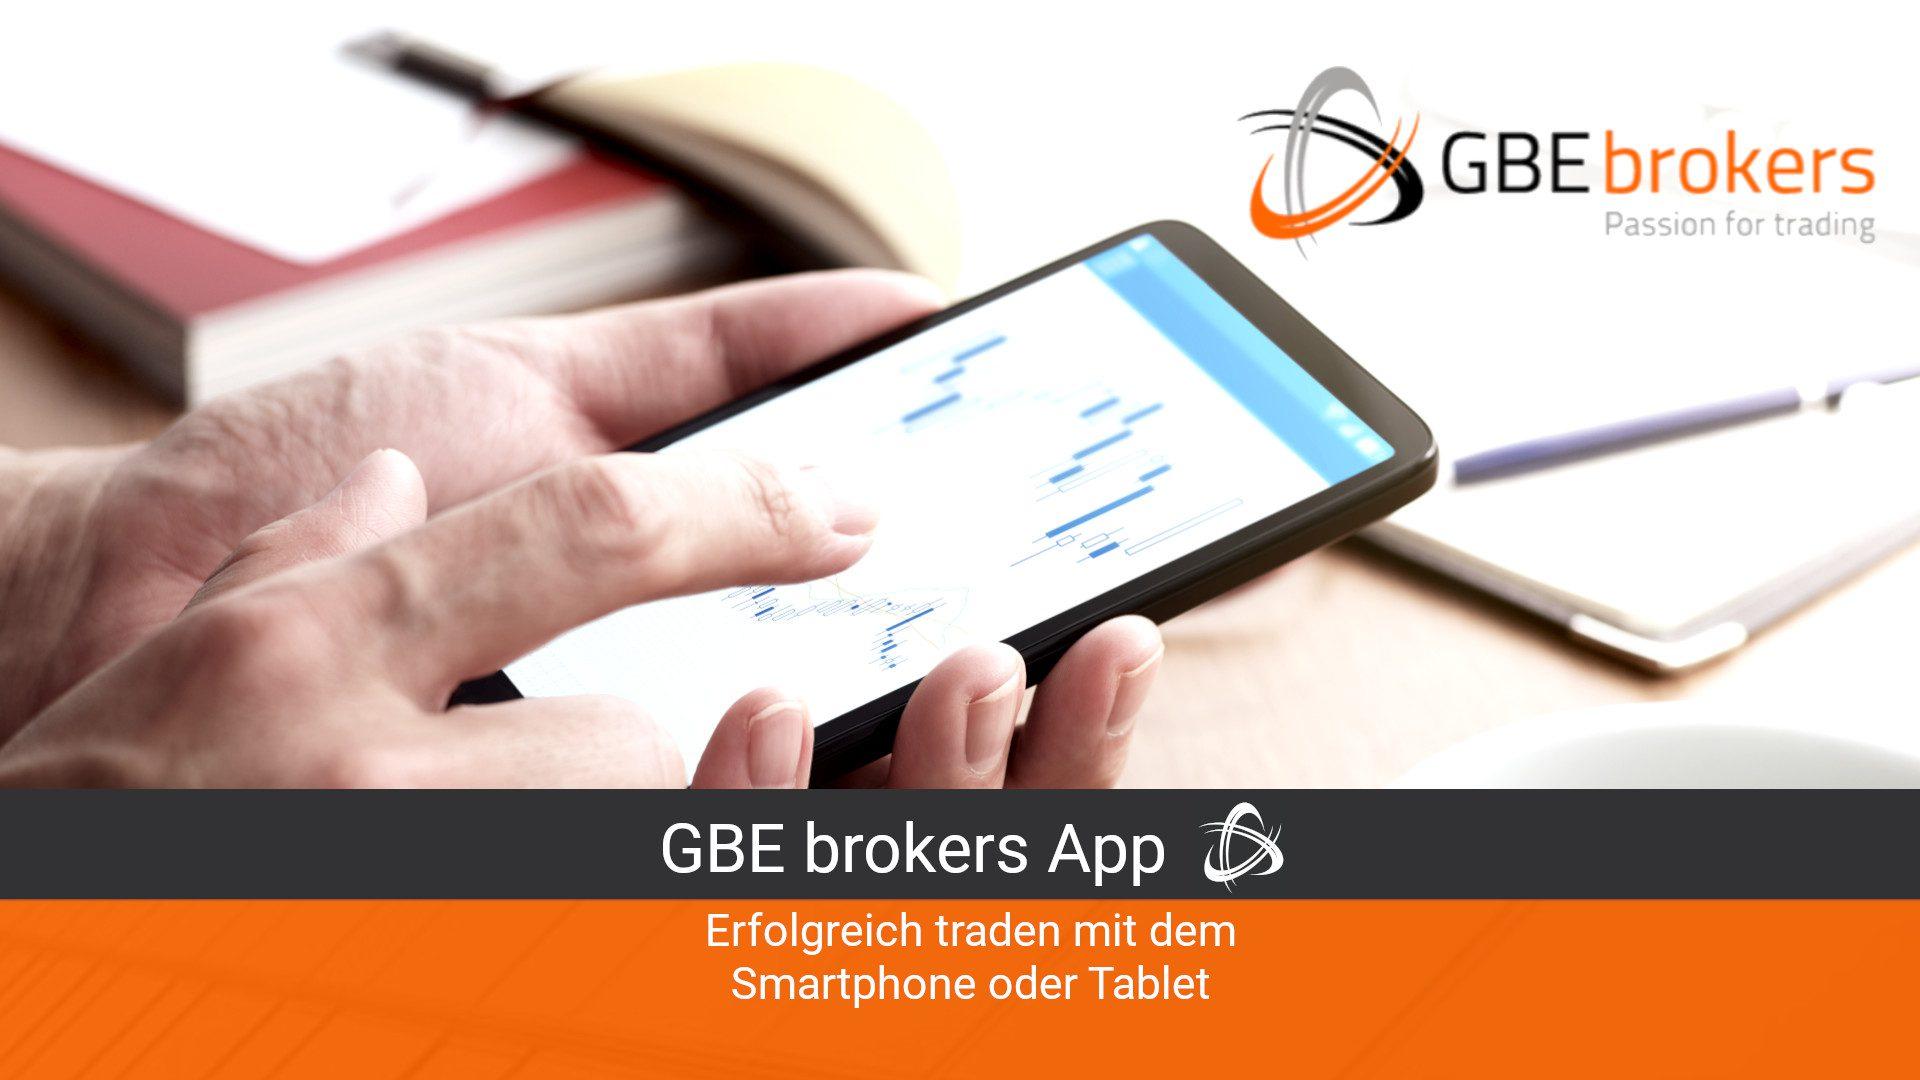 GBE brokers App: Erfolgreich Traden mit dem Smartphone oder Tablet (Update 2021)